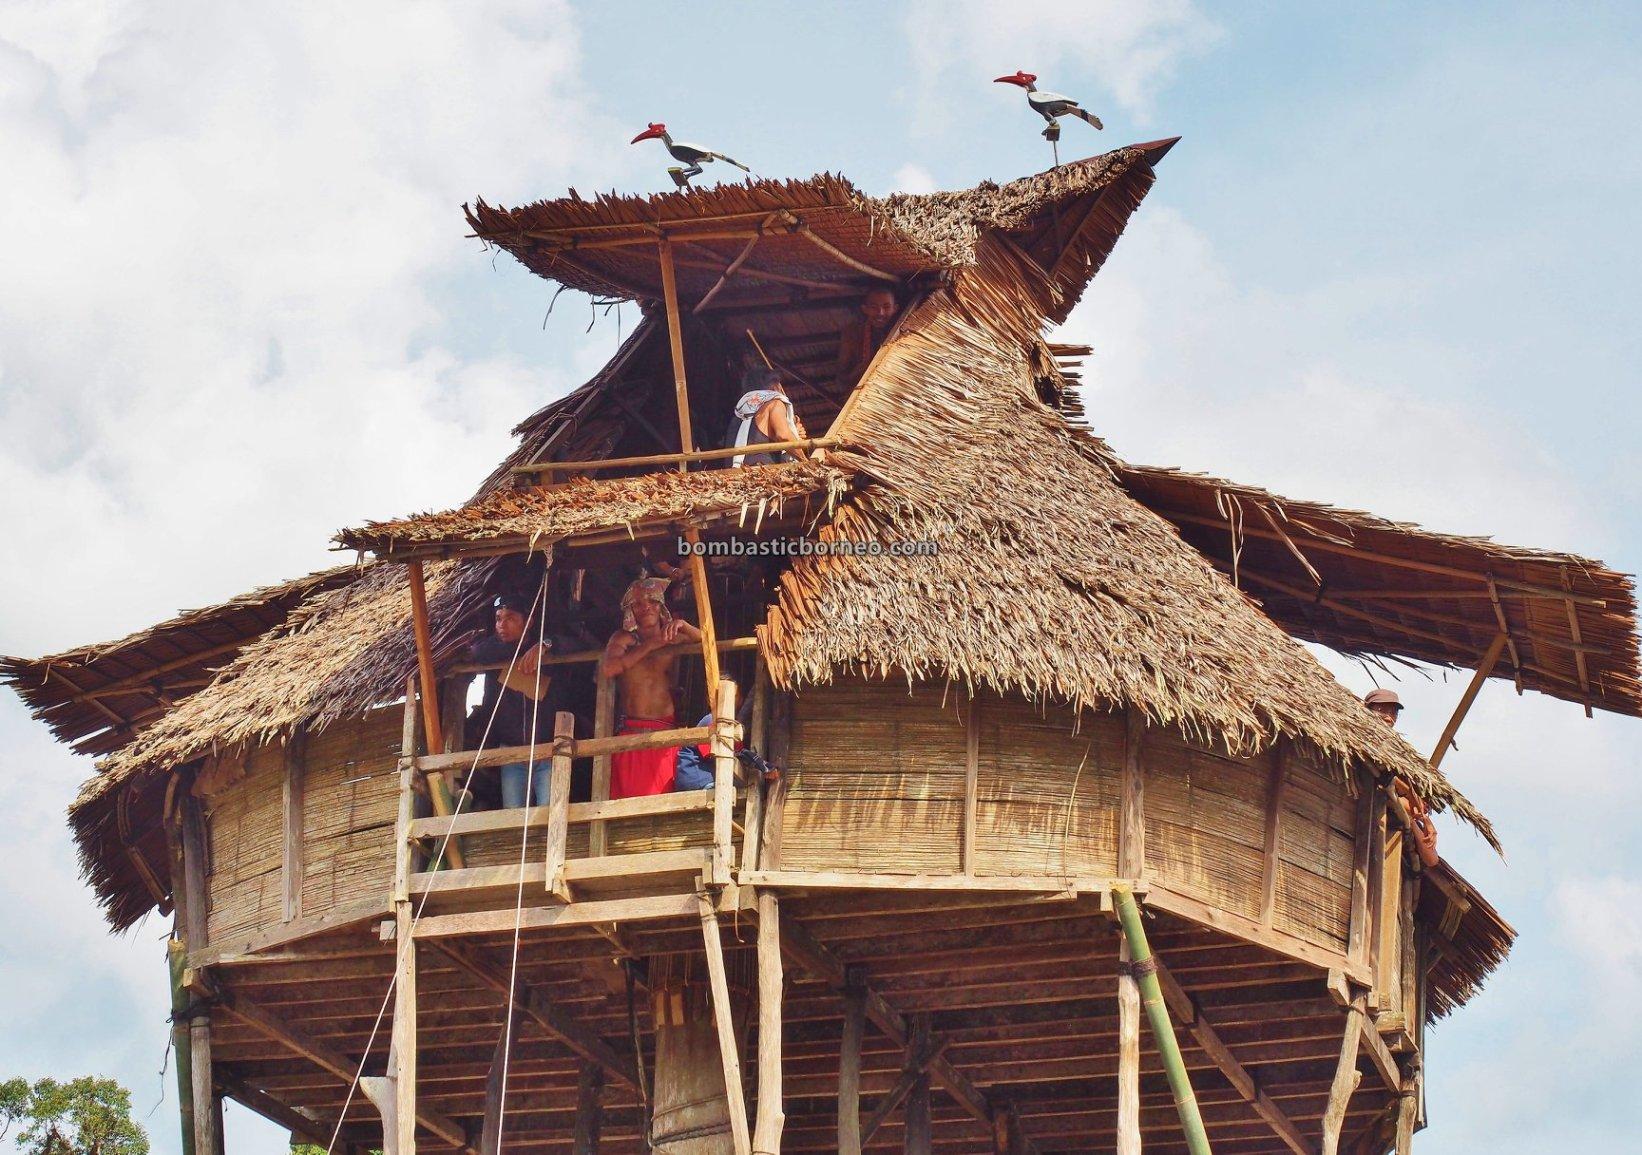 Nyobeng Gawai, Paddy Harvest Festival, authentic, traditional, Kalimantan Barat, Desa Hli Buei, Siding, Dayak Bidayuh, native, tribal, skull house, wisata budaya, Tourism, Trans Border, 探索婆罗洲比达友族, 印尼西加里曼丹部落